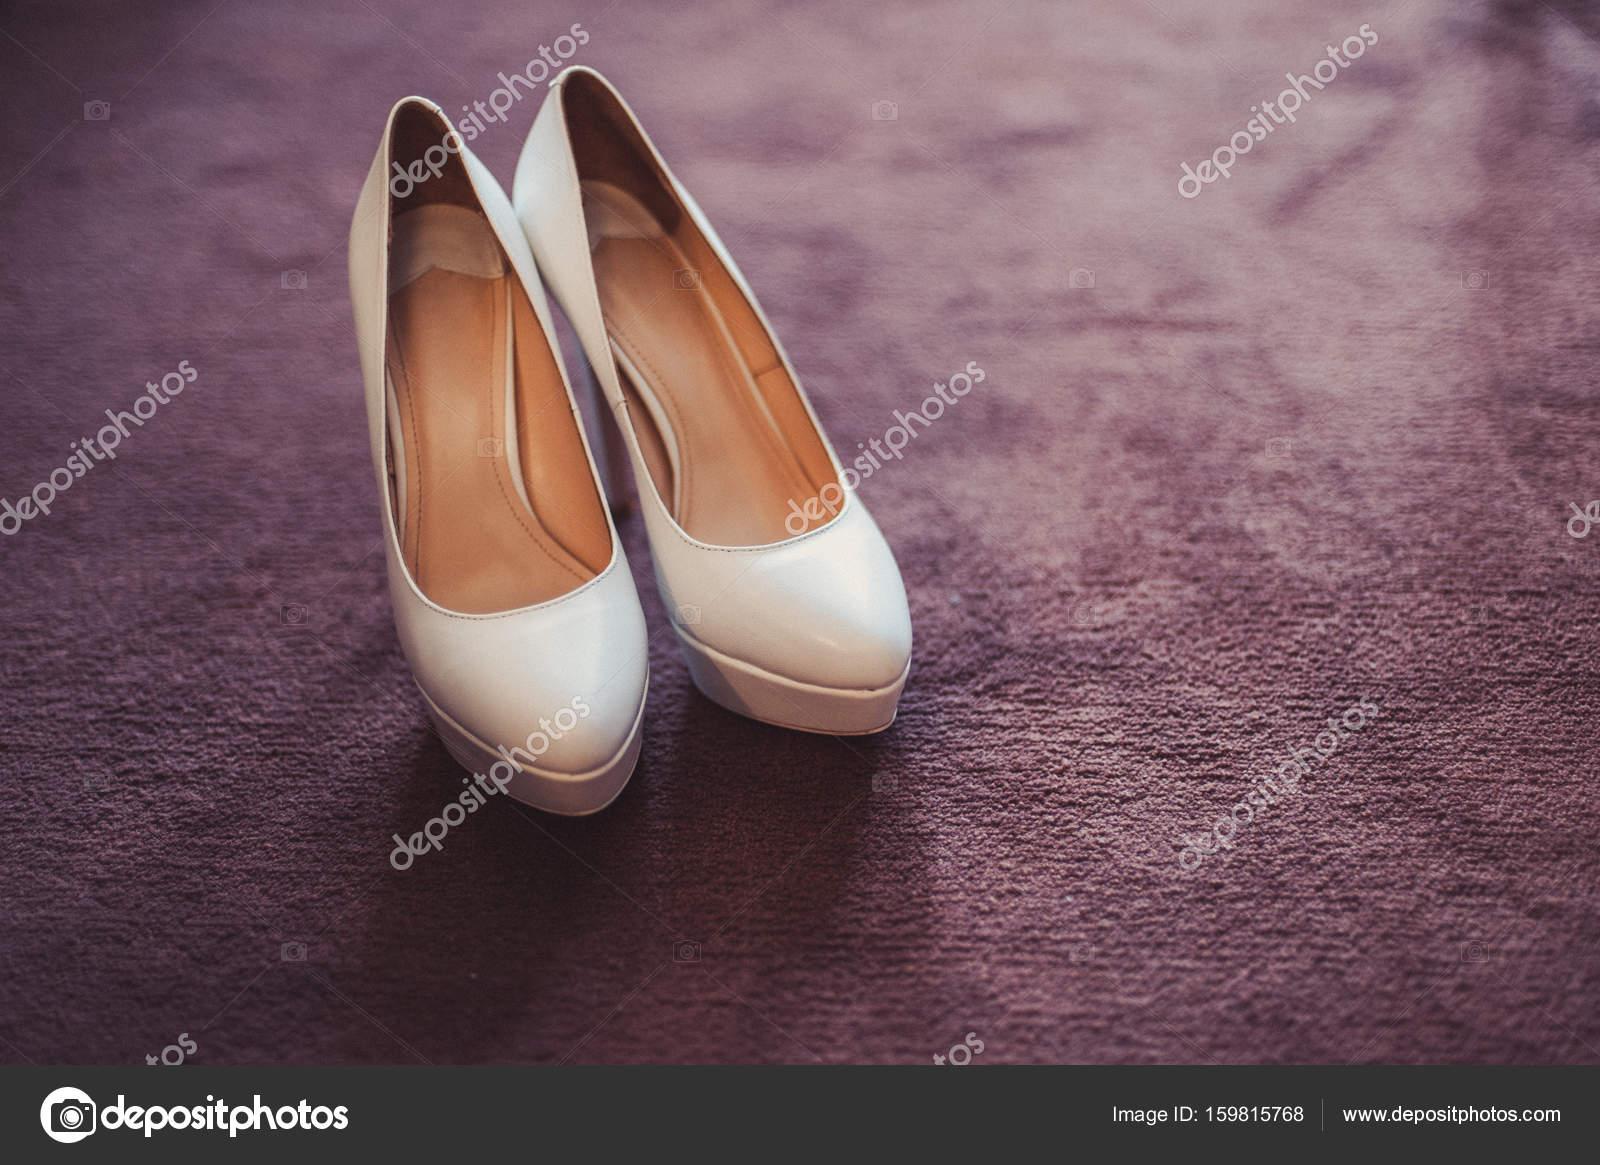 c3f75212146 Νύφη Νυφικά παπούτσια με ψηλά τακούνια και ασημένια σκουλαρίκια λαμπρά  ενδύματα προβάτων — Εικόνα από ...